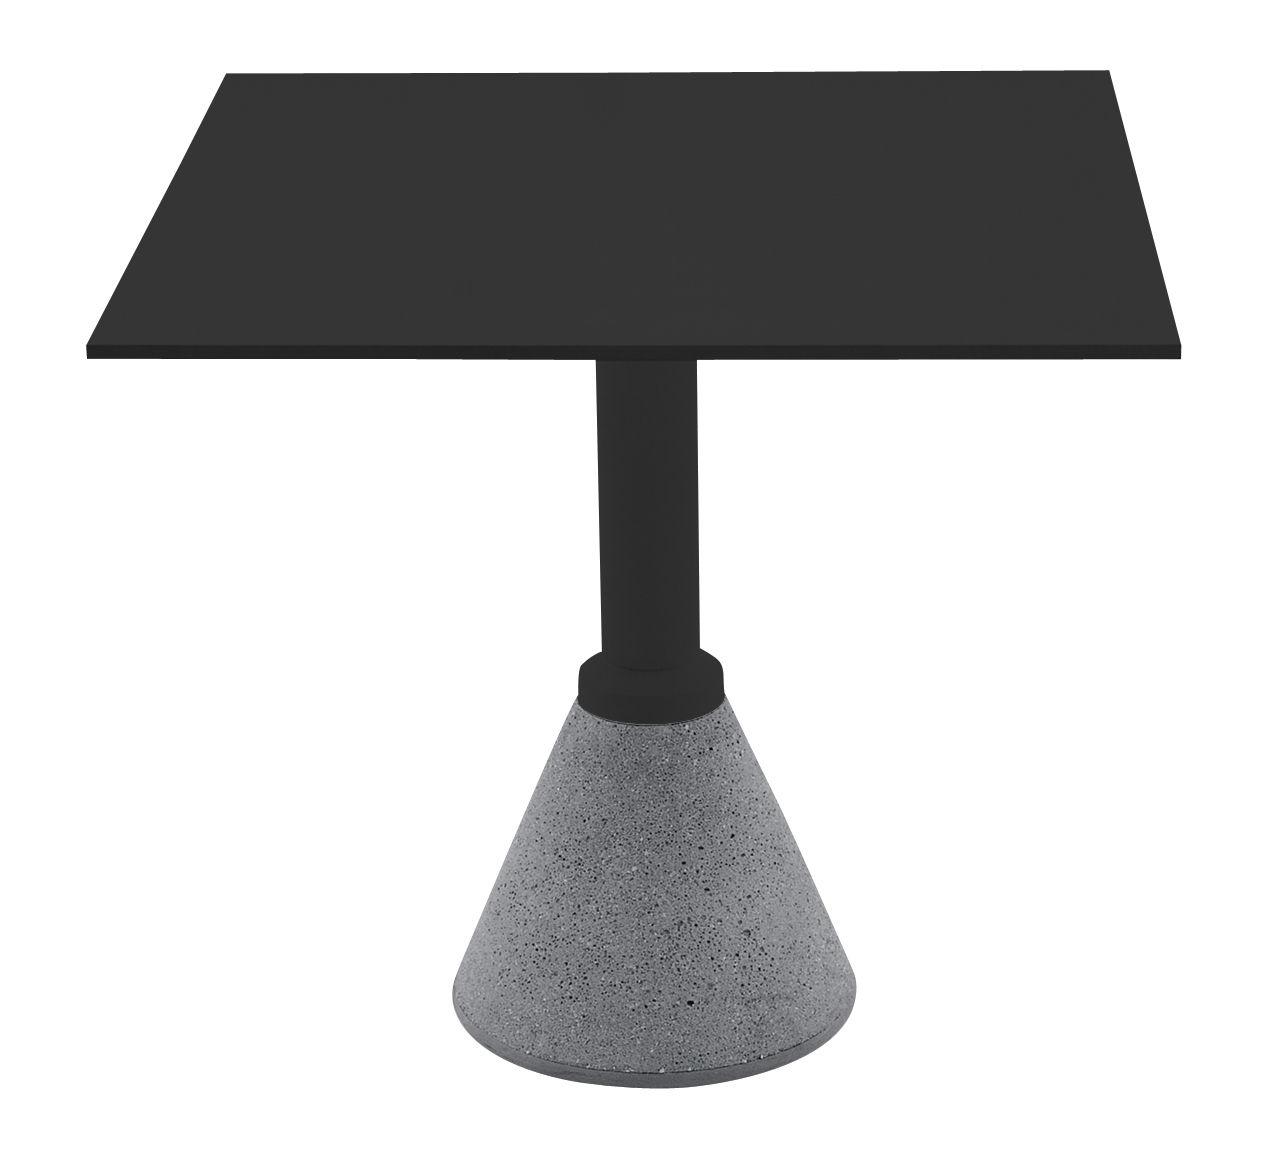 table de jardin one bistrot 79 x 79 cm noir 79 x 79 cm. Black Bedroom Furniture Sets. Home Design Ideas